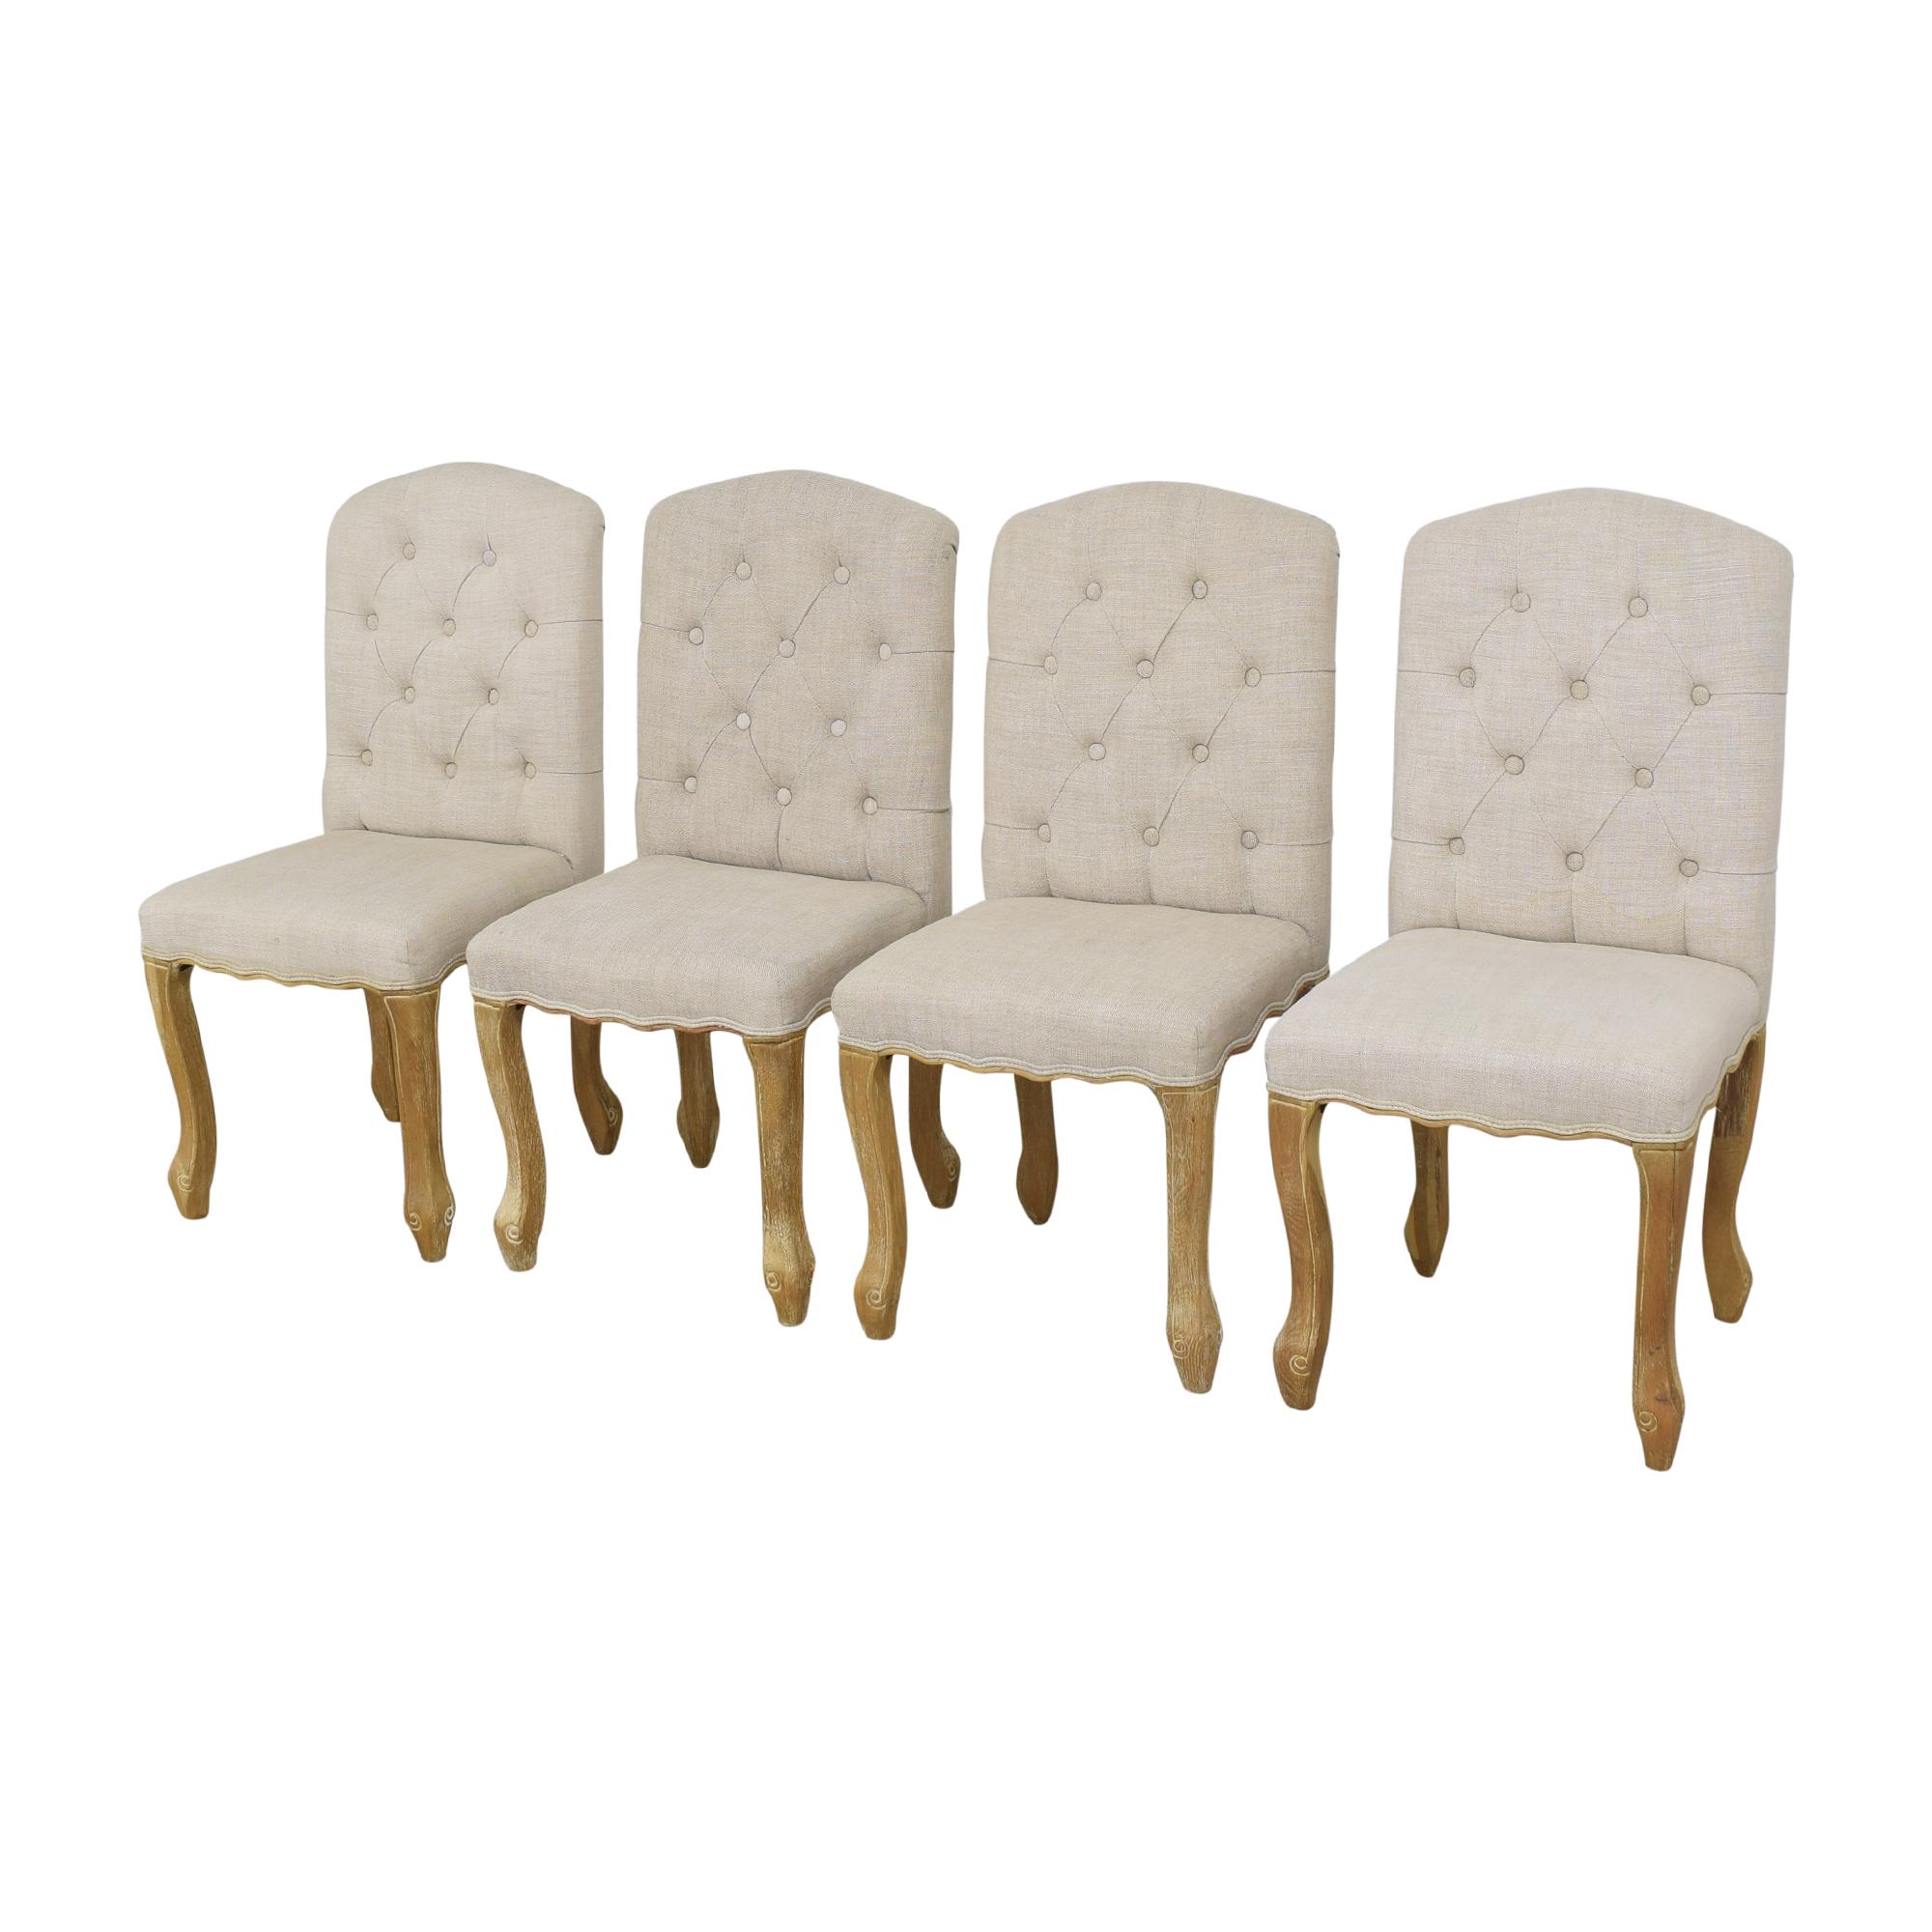 Zuo Modern Zuo Modern Noe Valley Chairs second hand